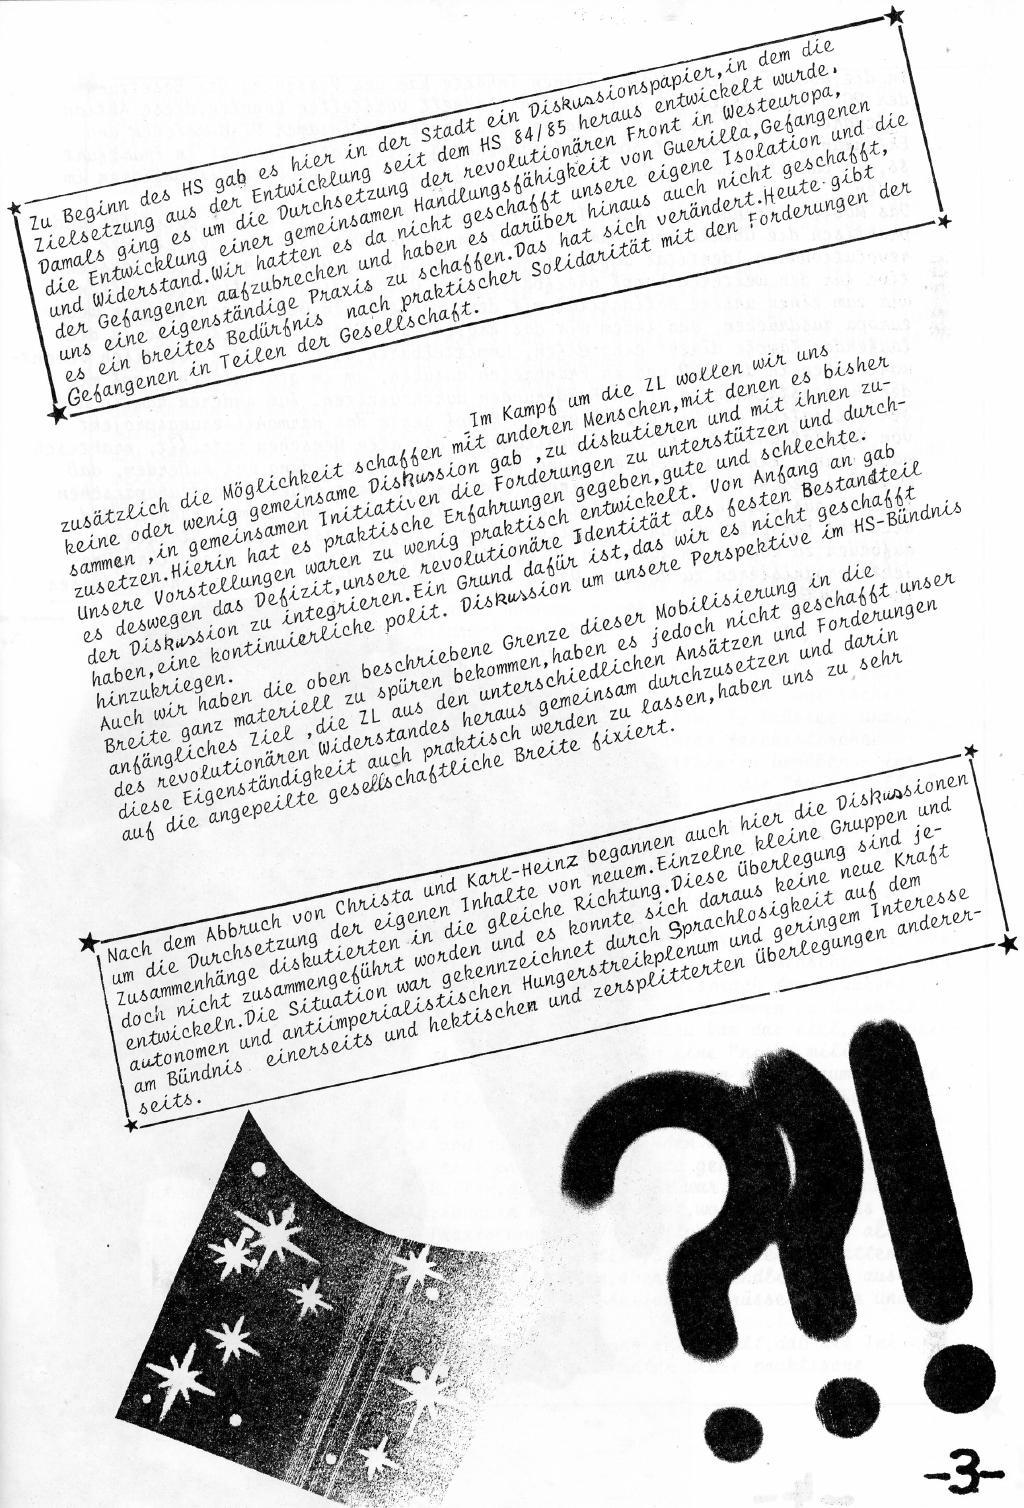 Belgien_Doku_Besetzung_EG_Kommission_1989_005